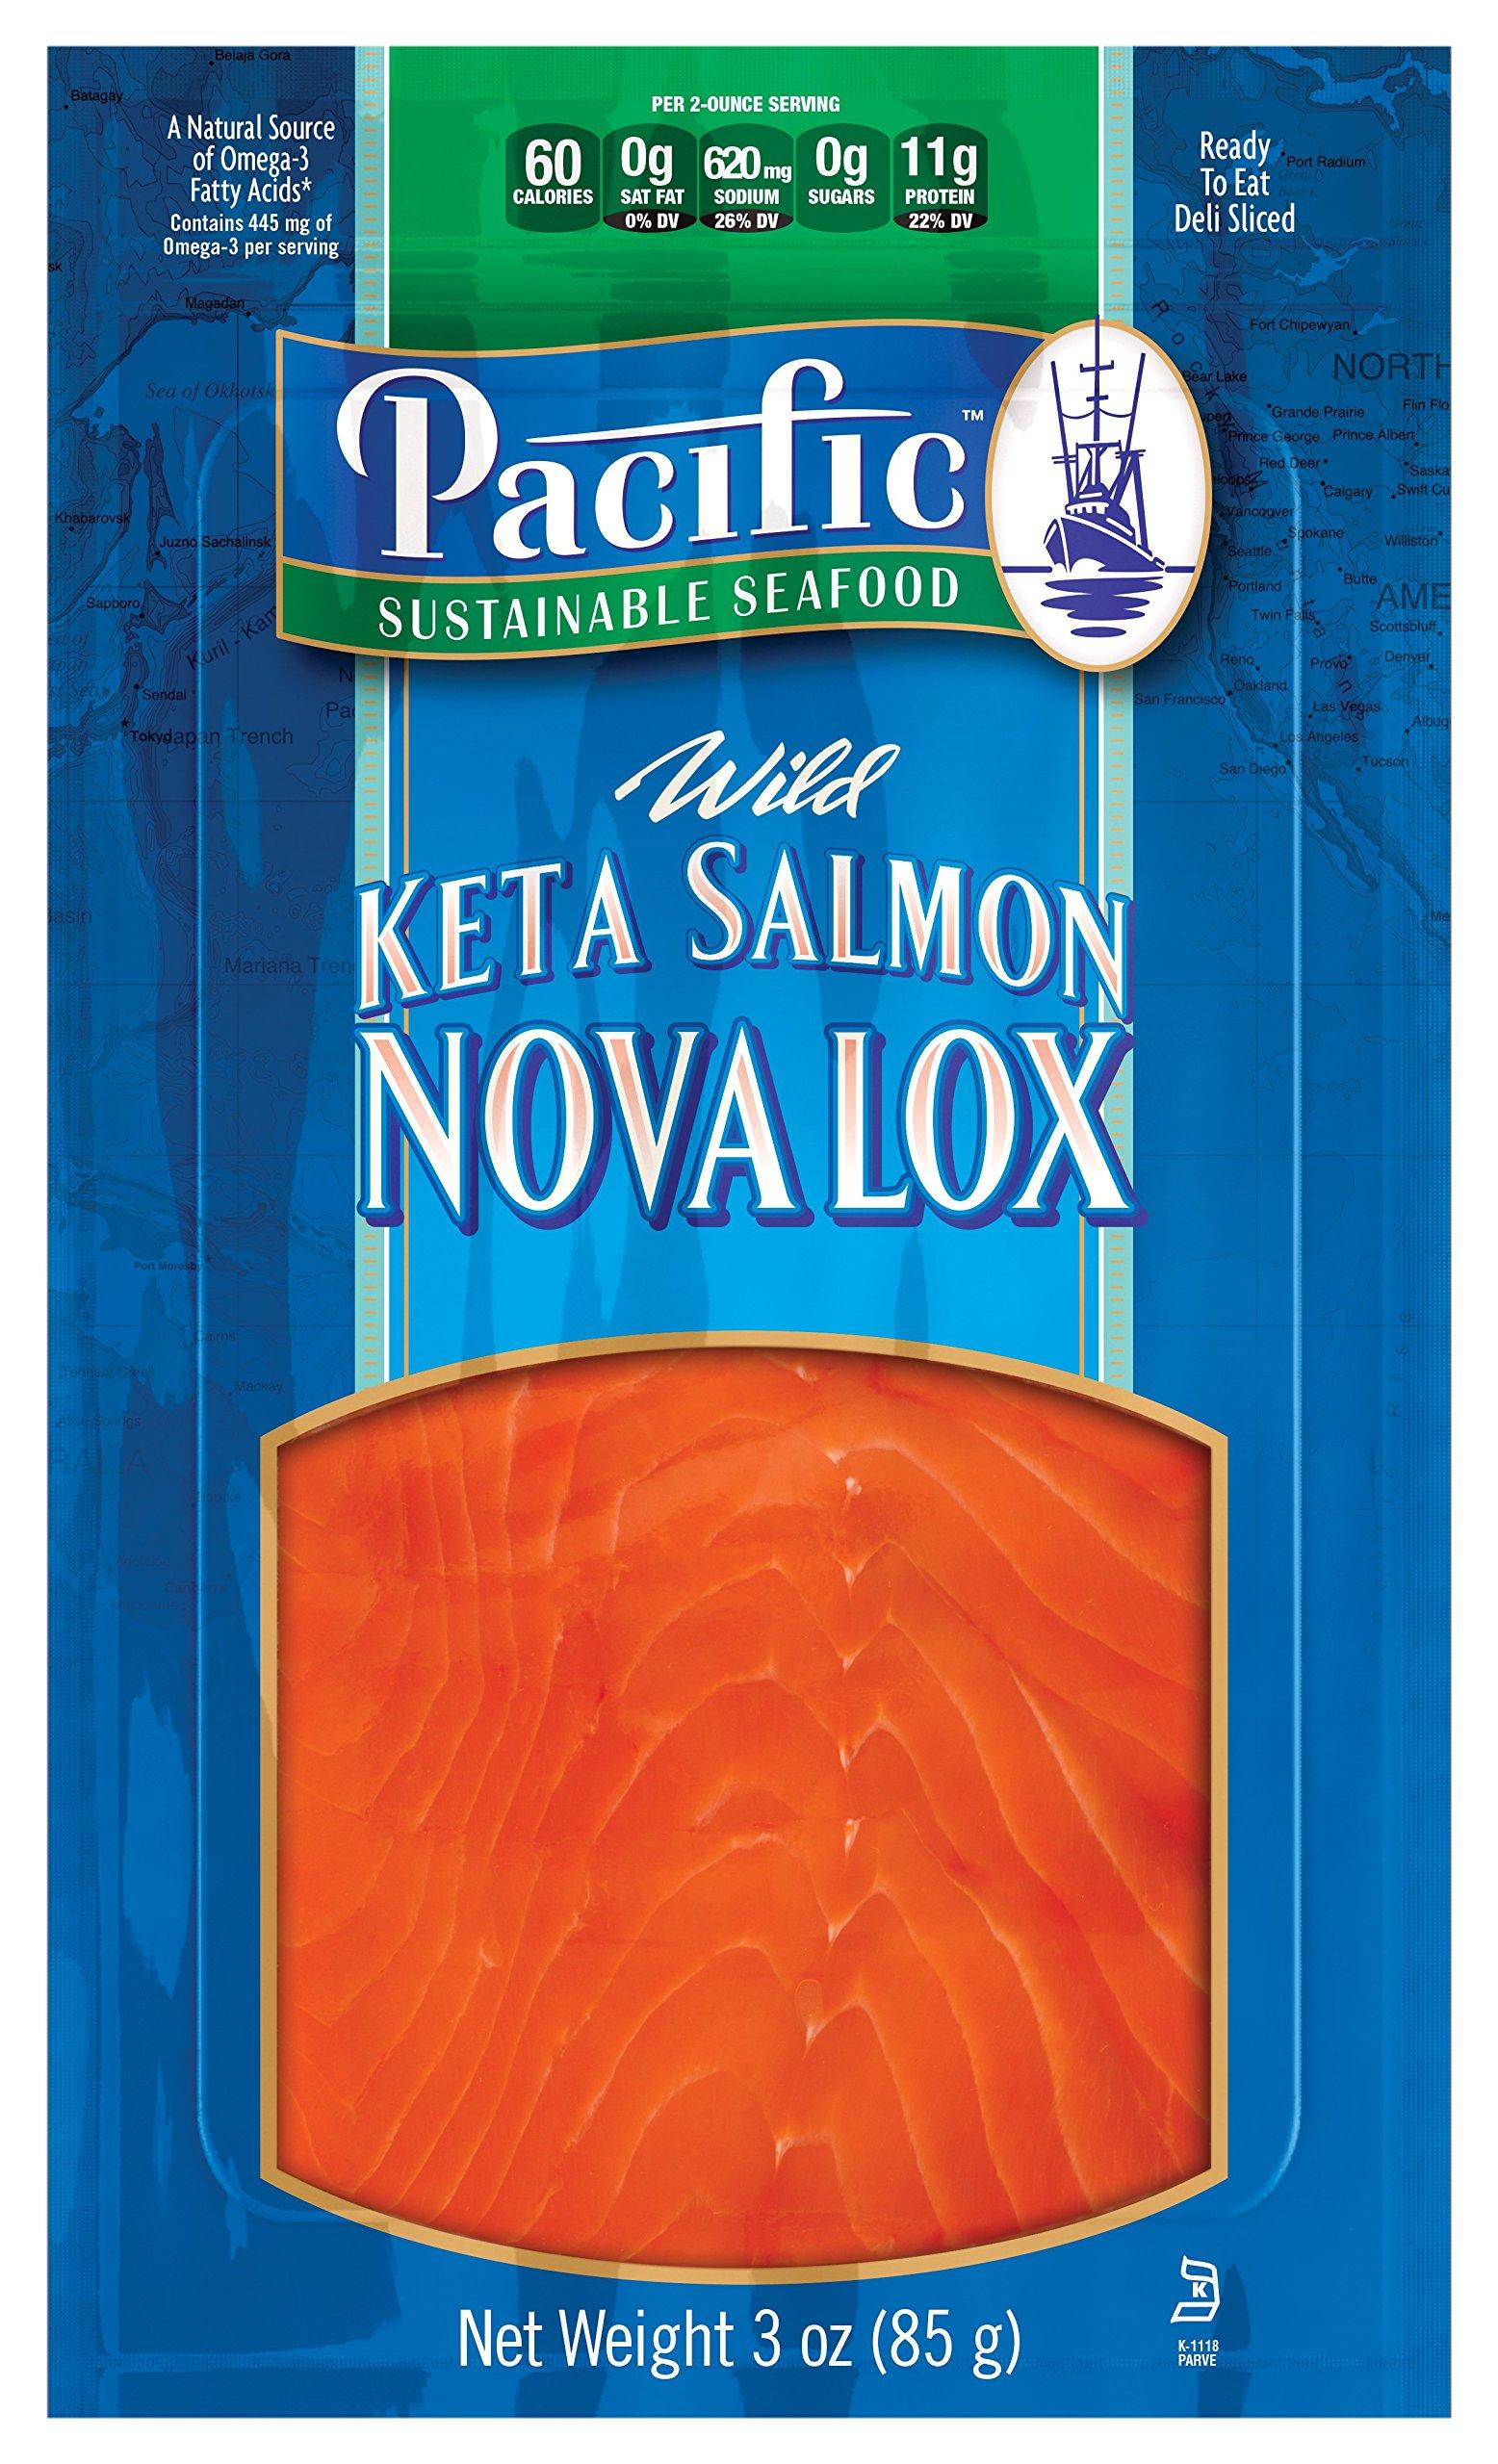 Smoked Salmon Lox Keta 1 Lb Tray Frozen by Newport